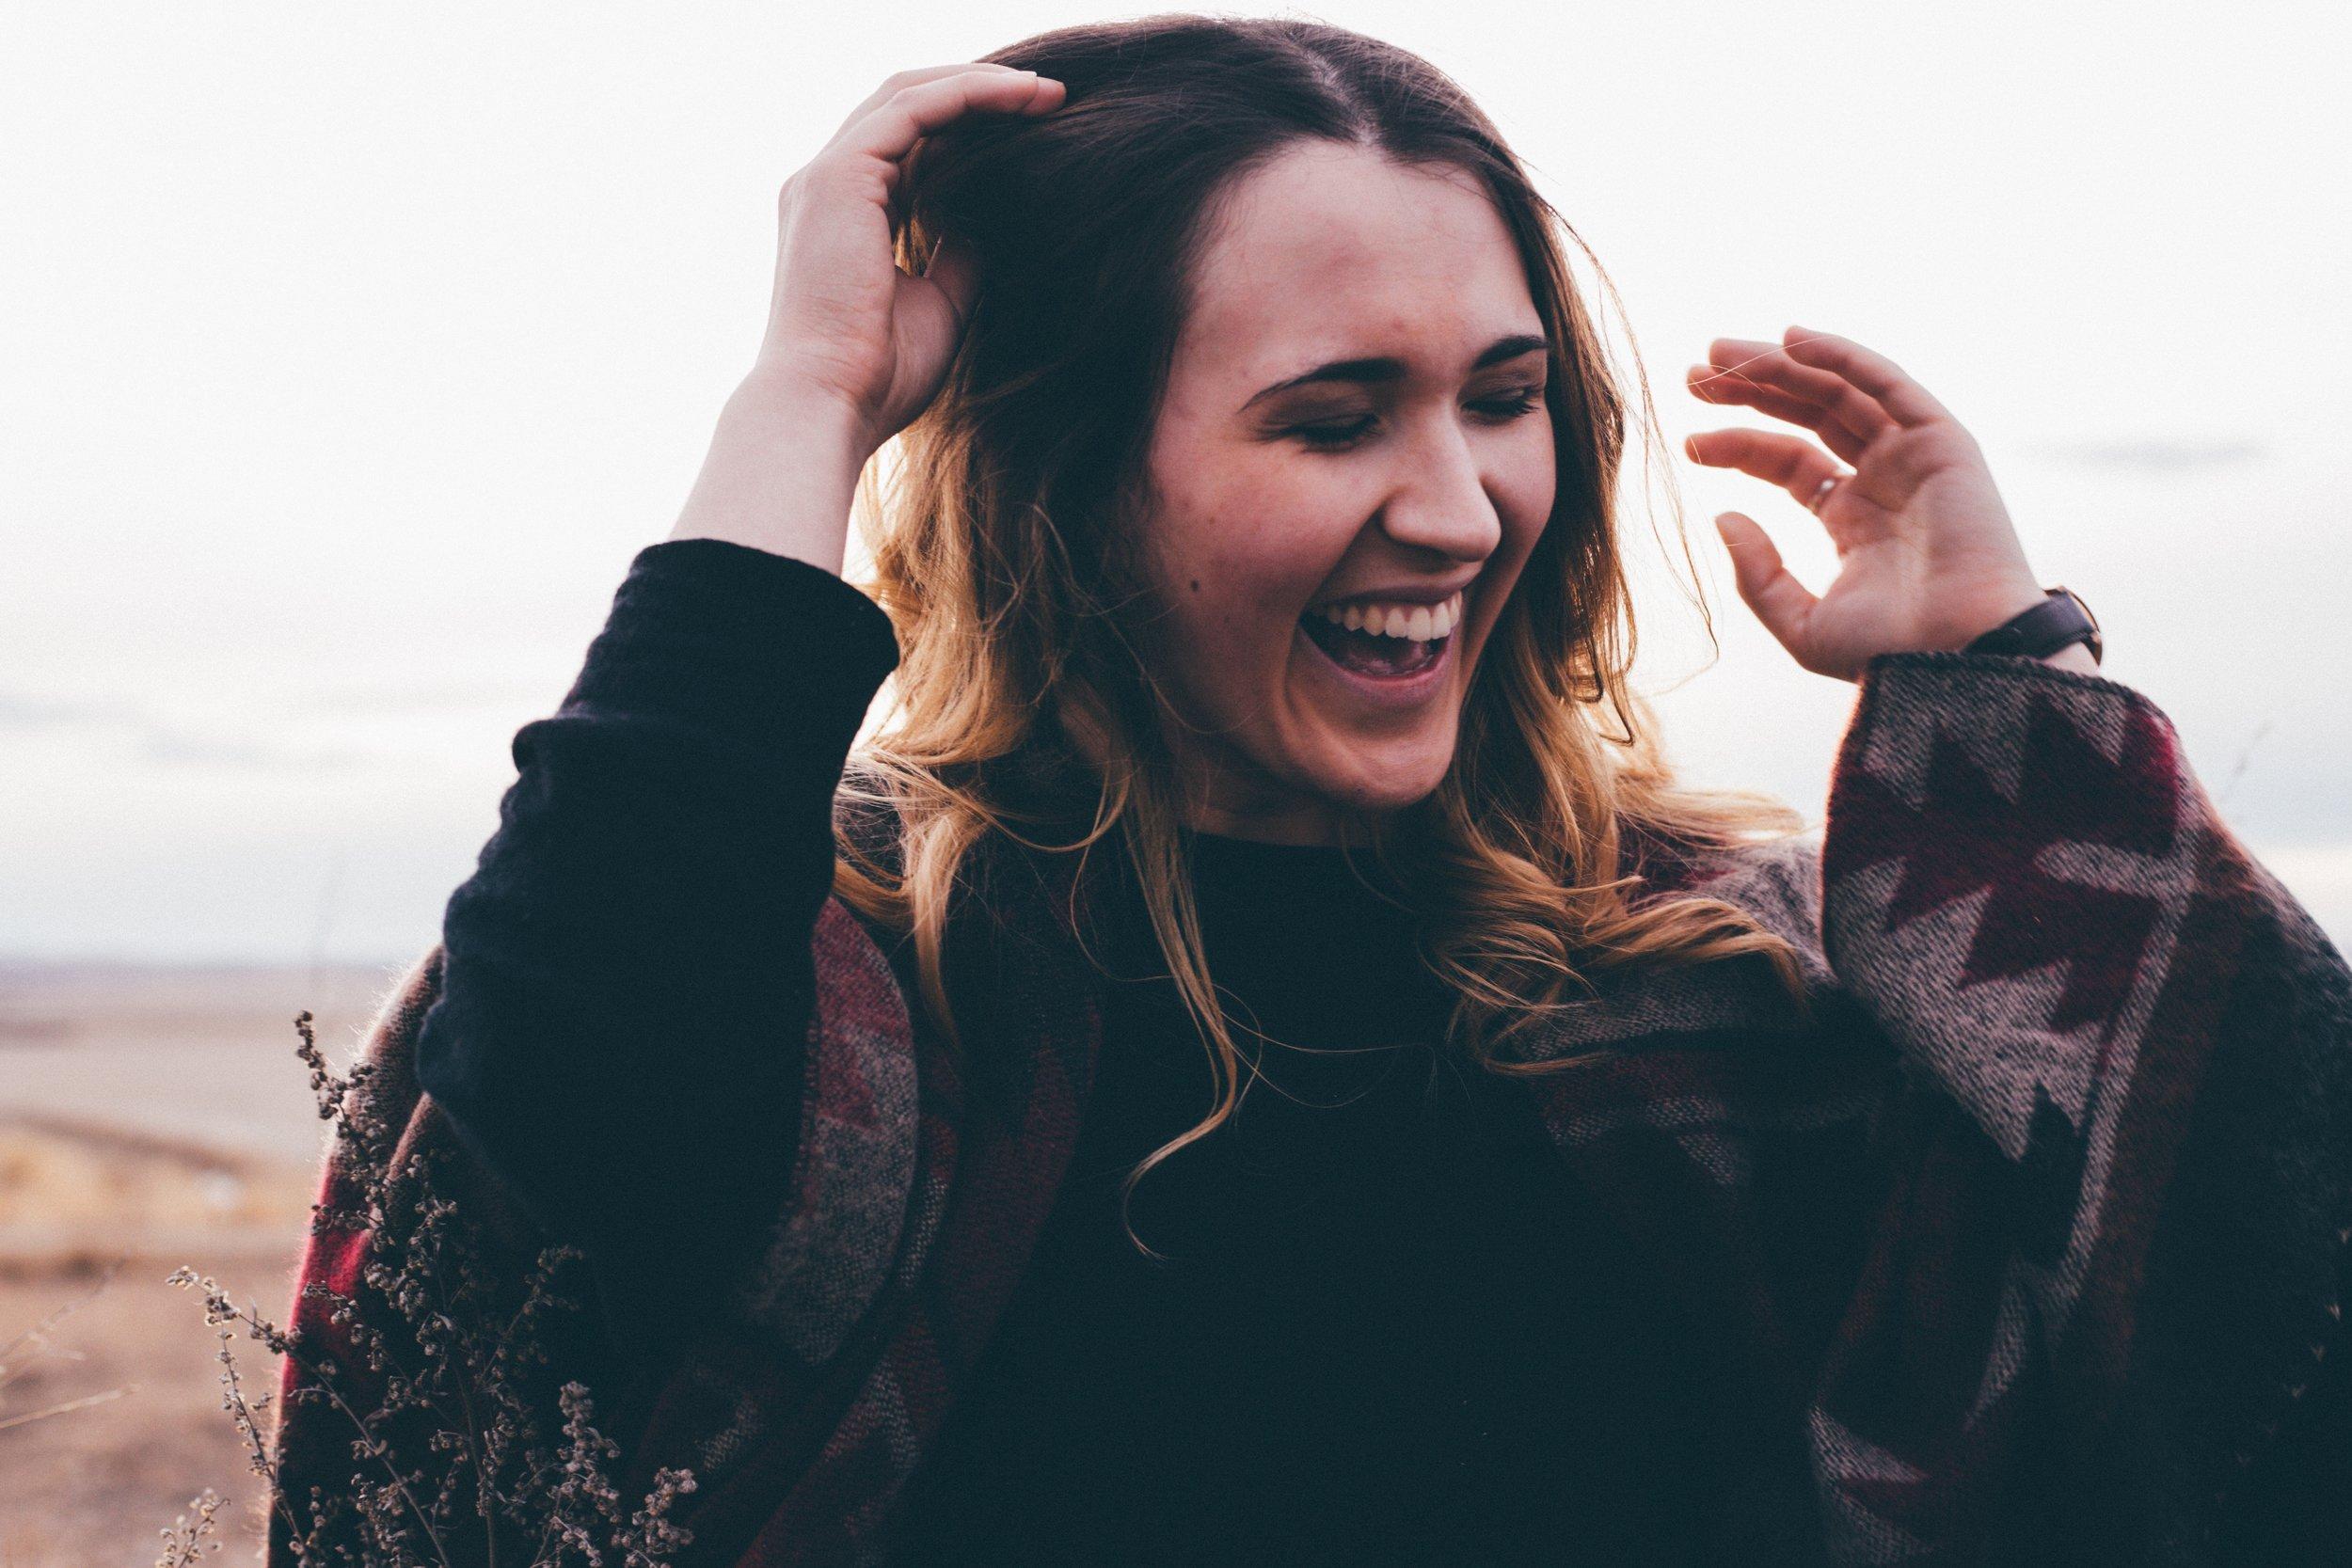 Laughing, Joy, Free, priscilla-du-preez-318418.jpg